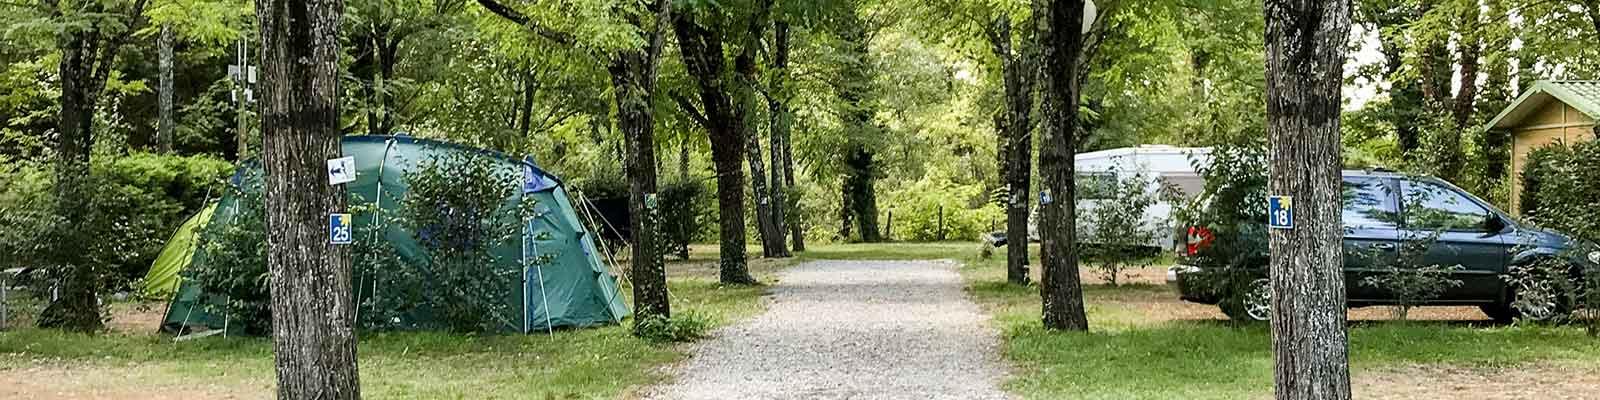 Accès camping Plan d'eau Ardèche